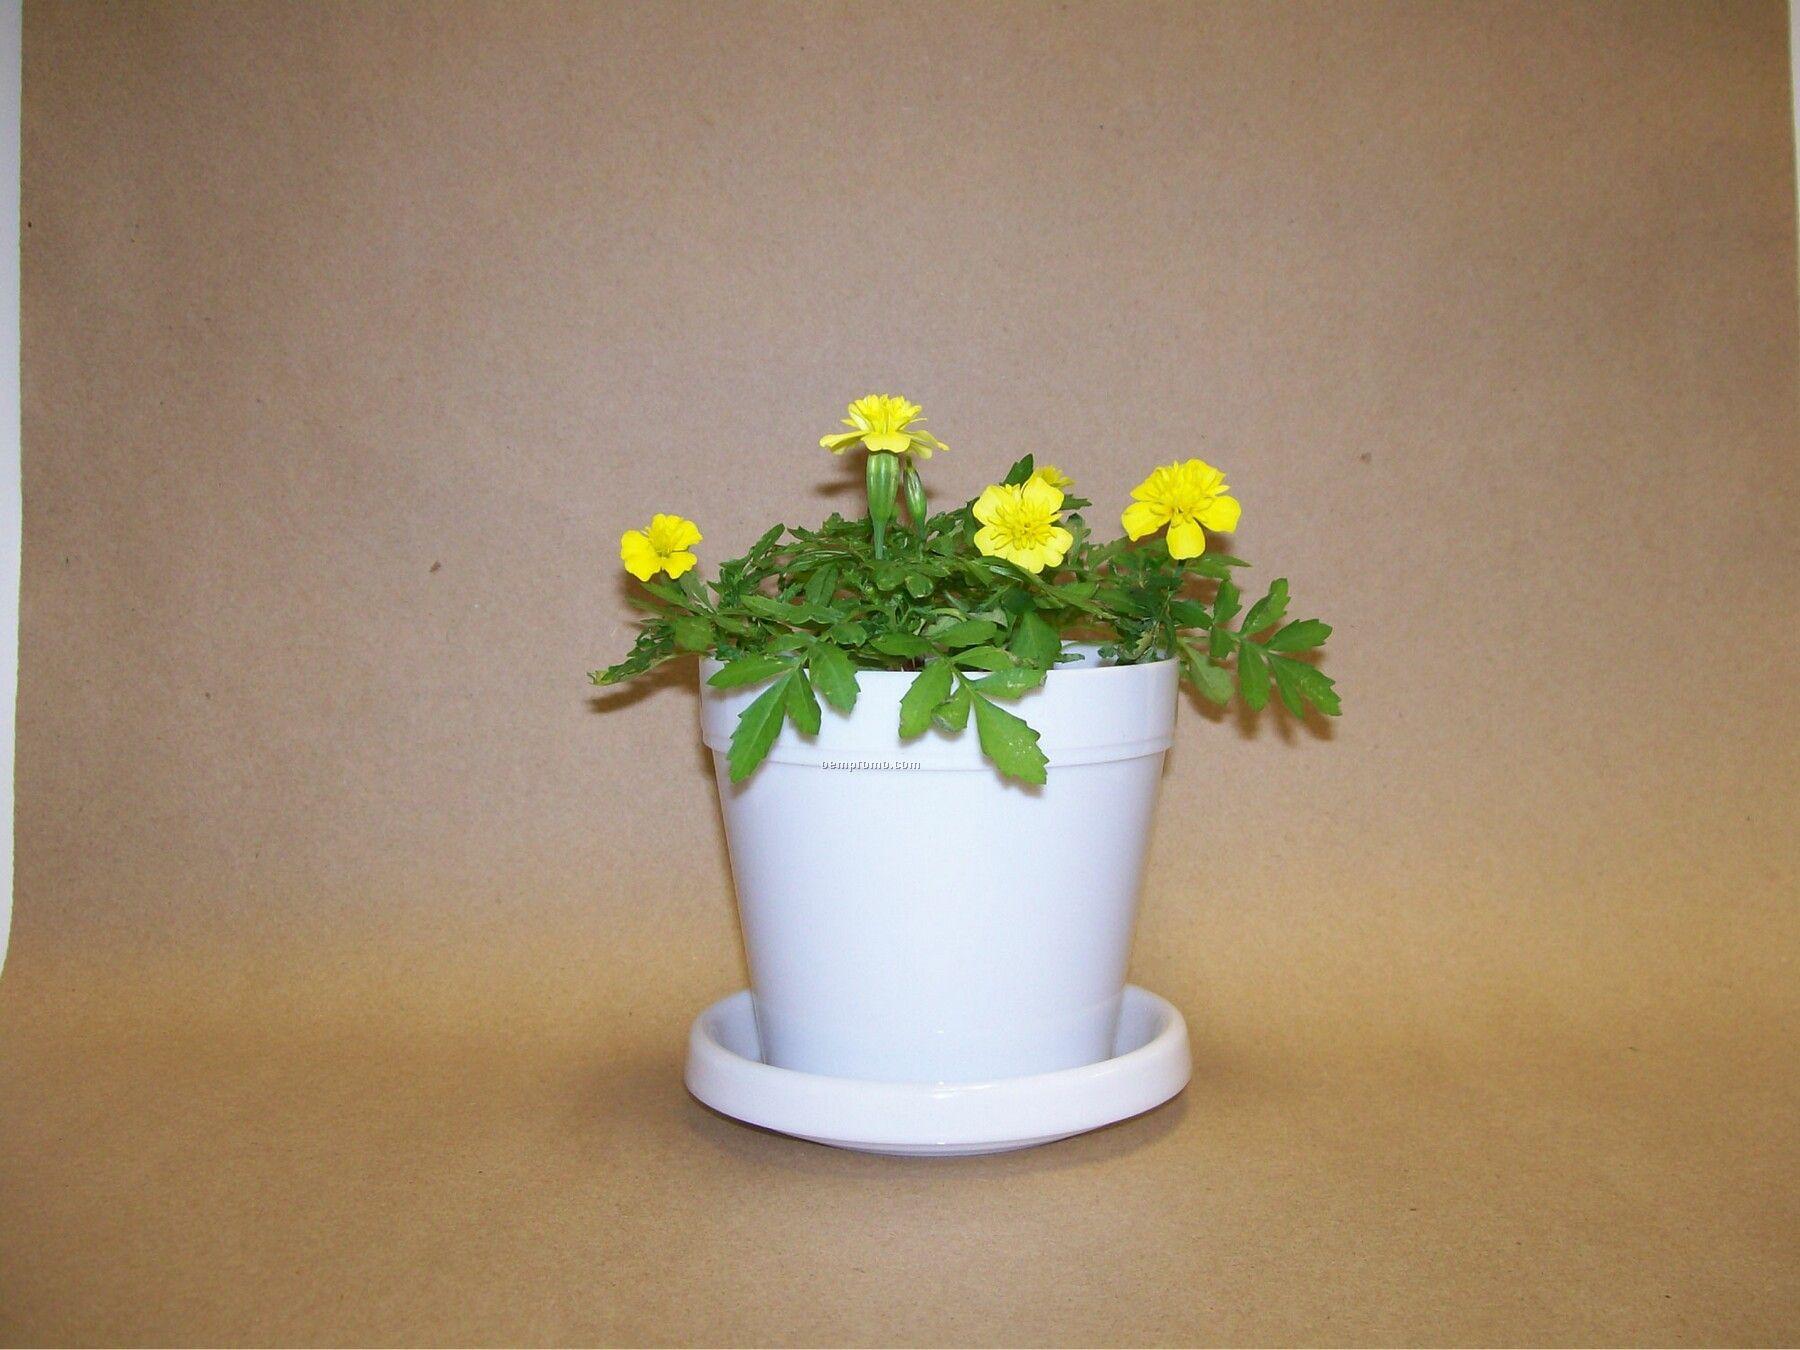 Marigold Lemon Drop Standard Logo Planter Kit (No Imprint)